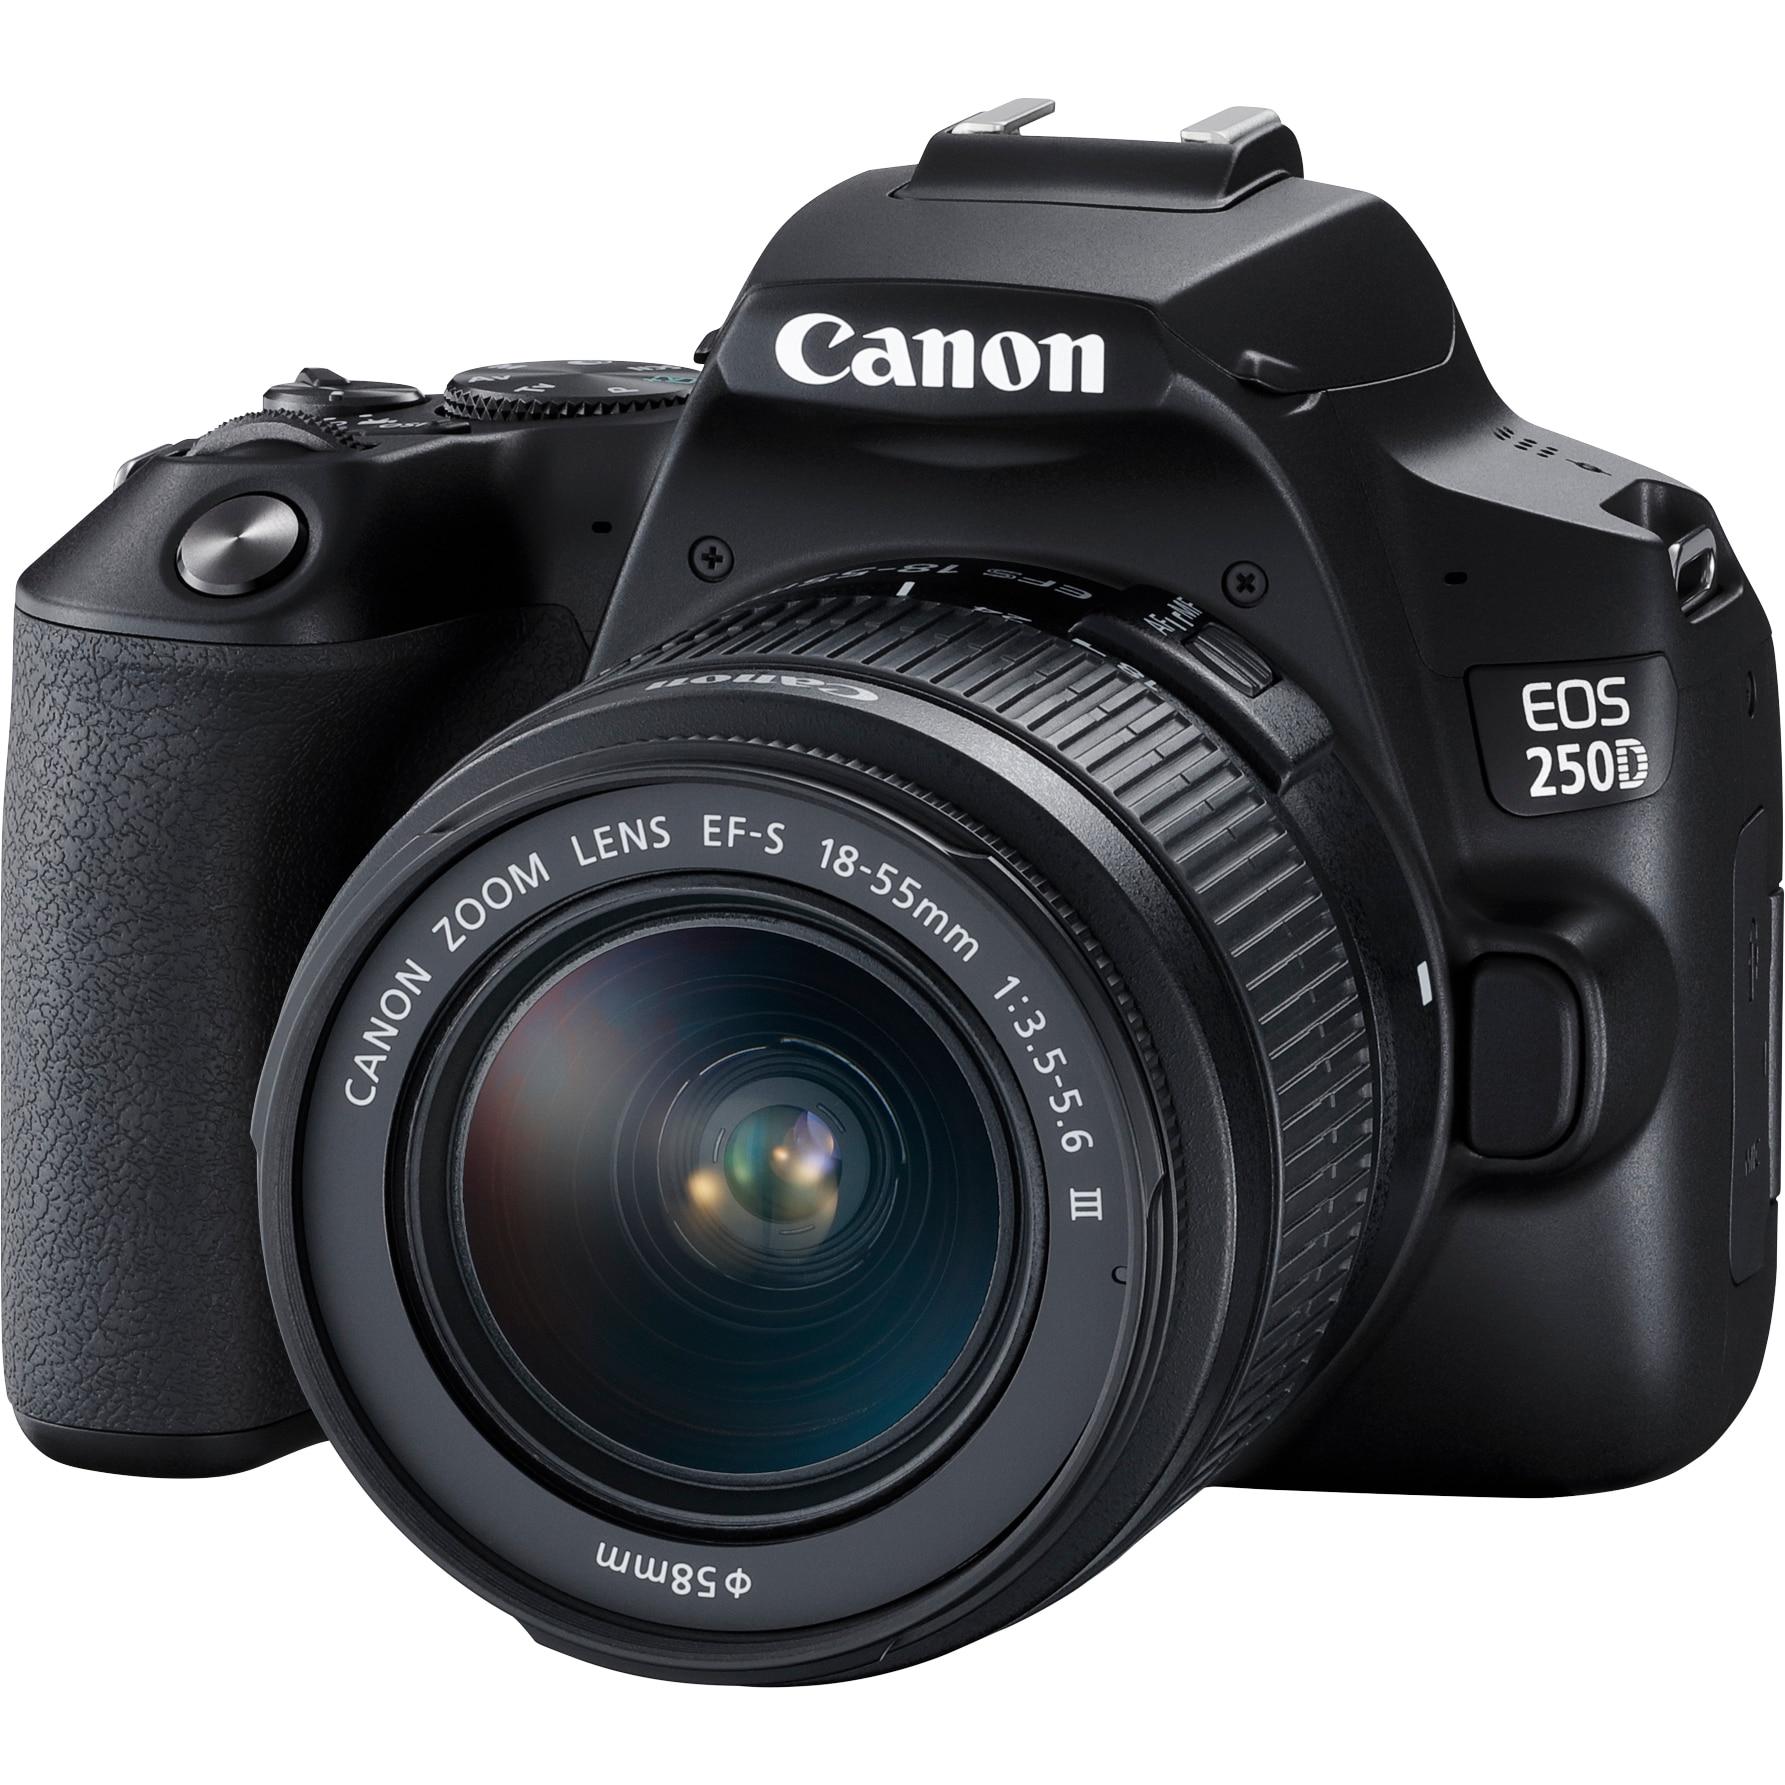 Fotografie Aparat foto DSLR Canon EOS 250D, 24.1 MP, Wi-Fi, 4K, Negru + Obiectiv EF-S 18-55mm, f/3.5-5.6 III